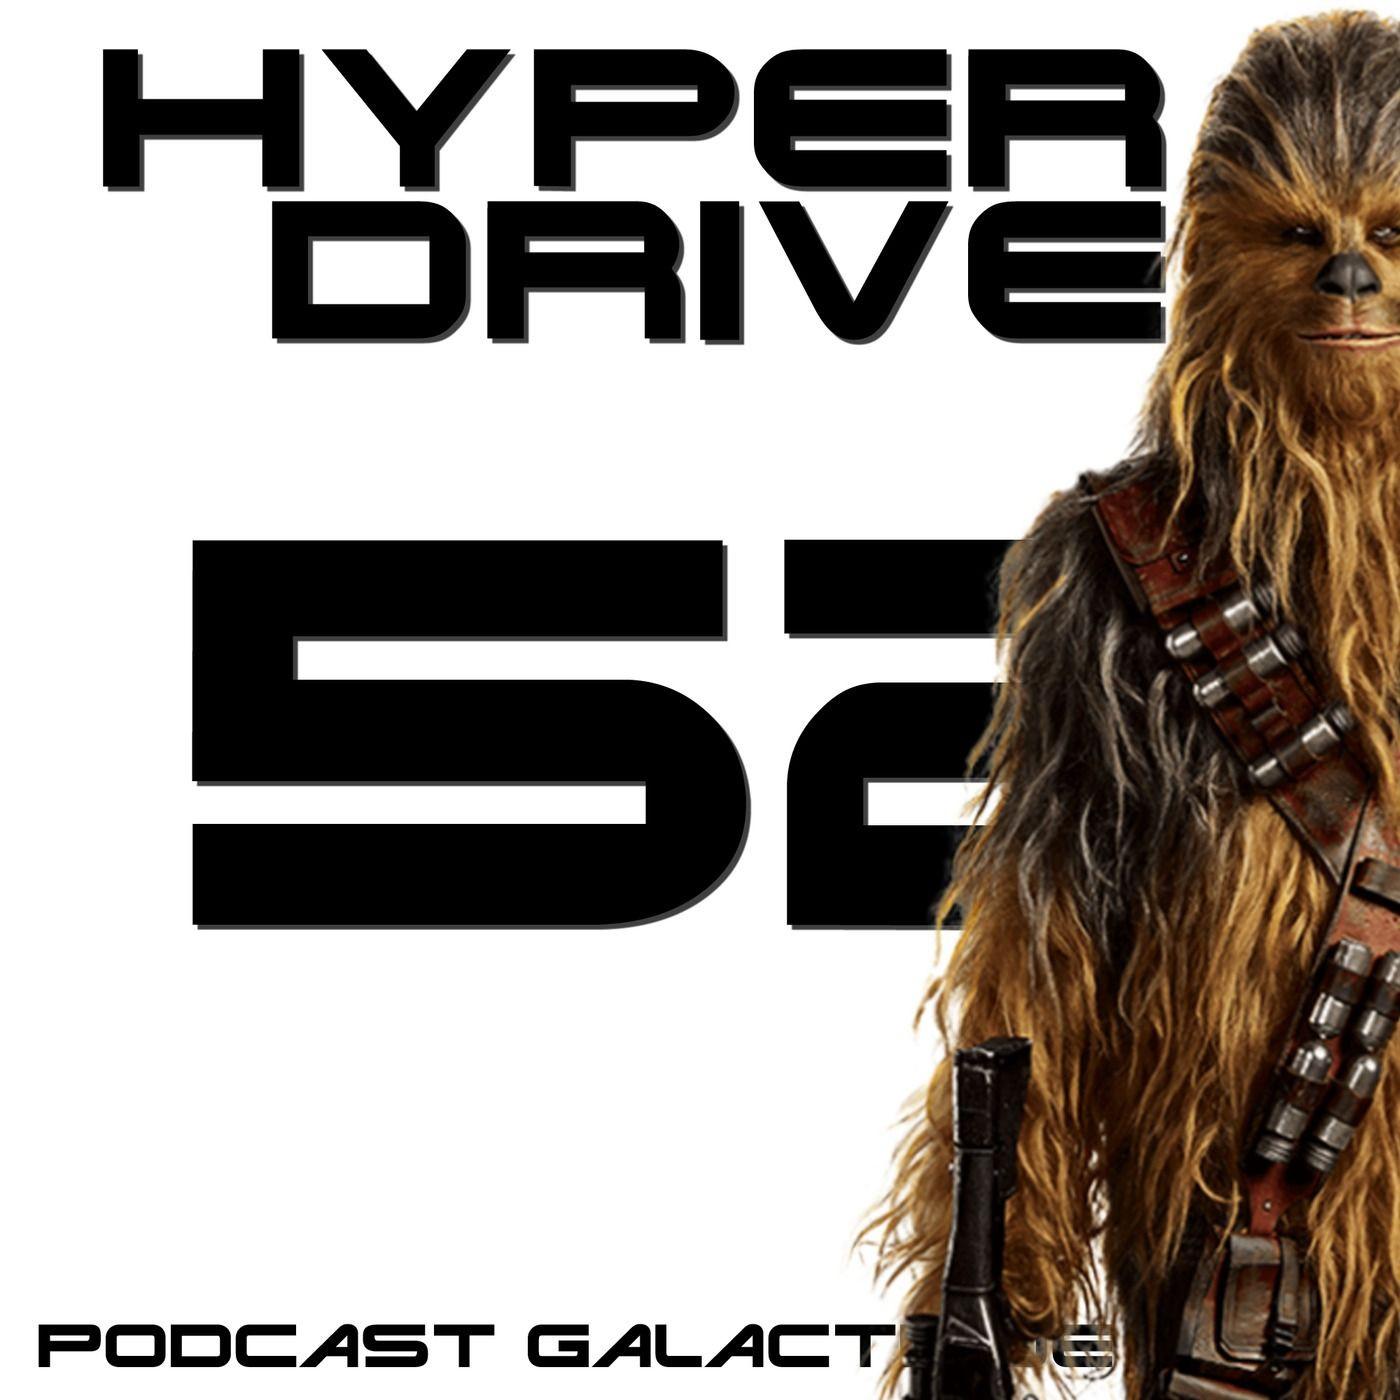 Episode 52 - Star Wars par Disney : le bilan